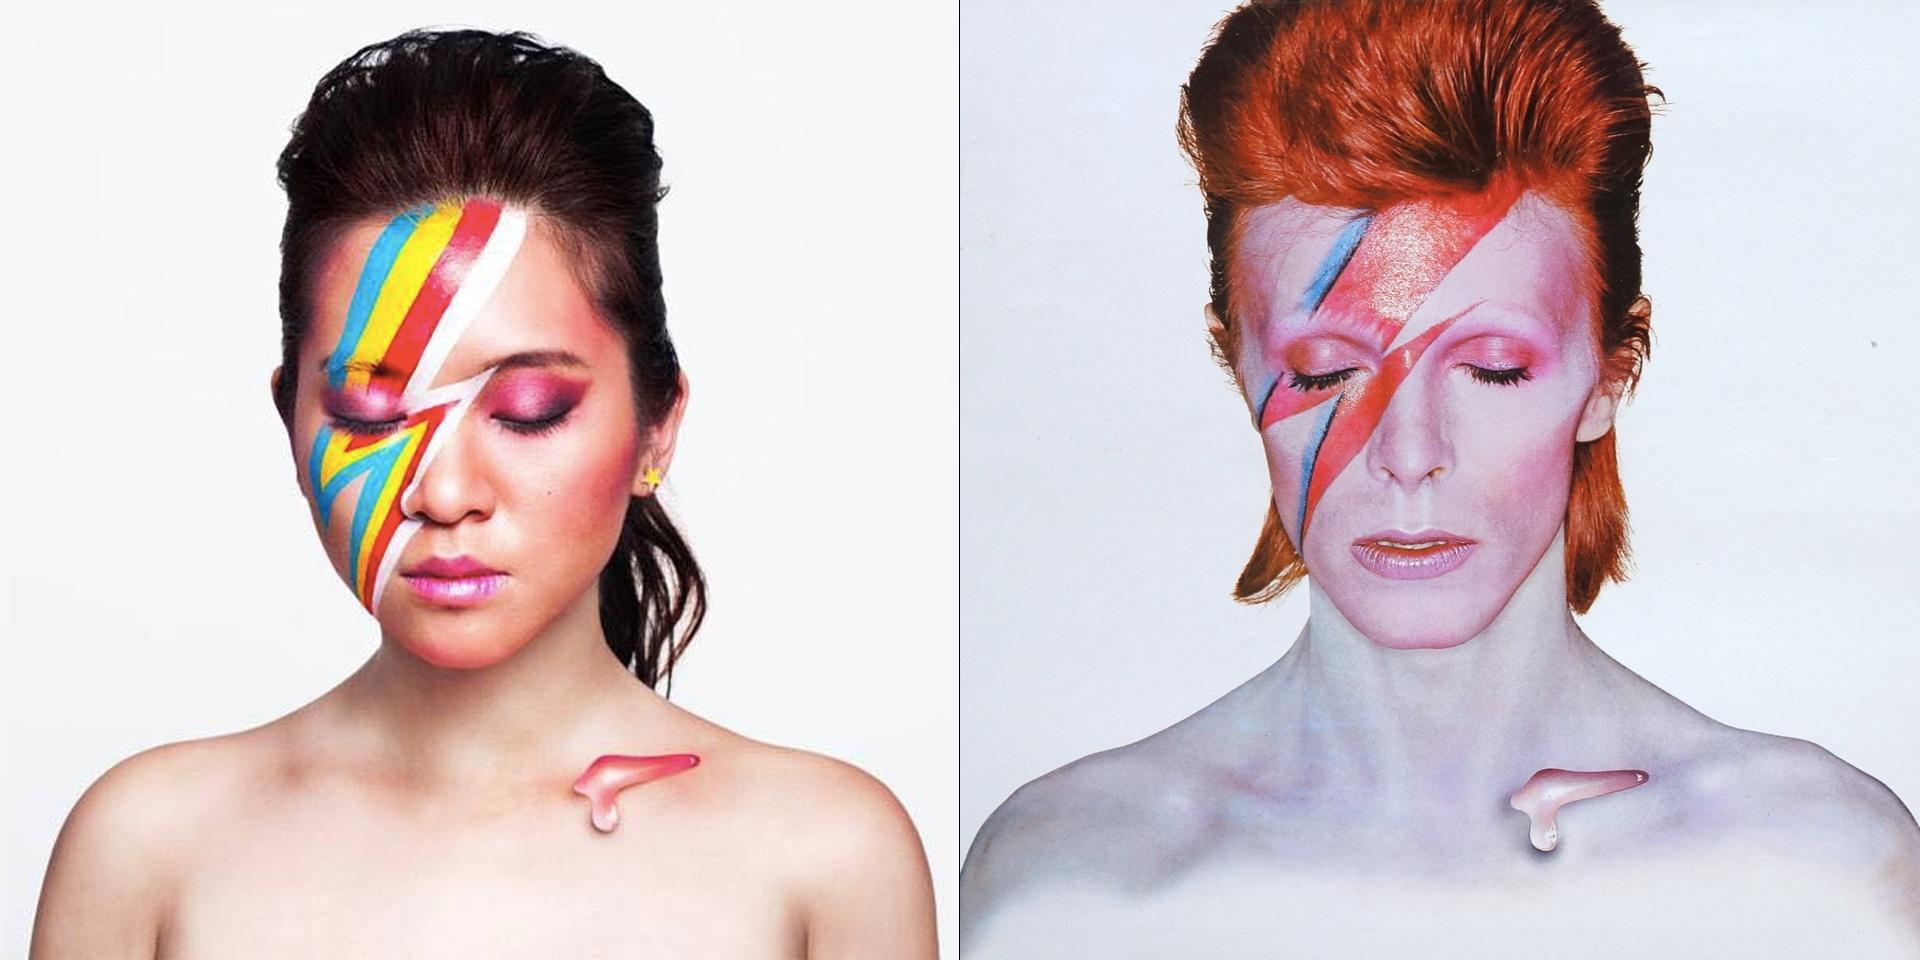 Singaporean musicians pay tribute to David Bowie